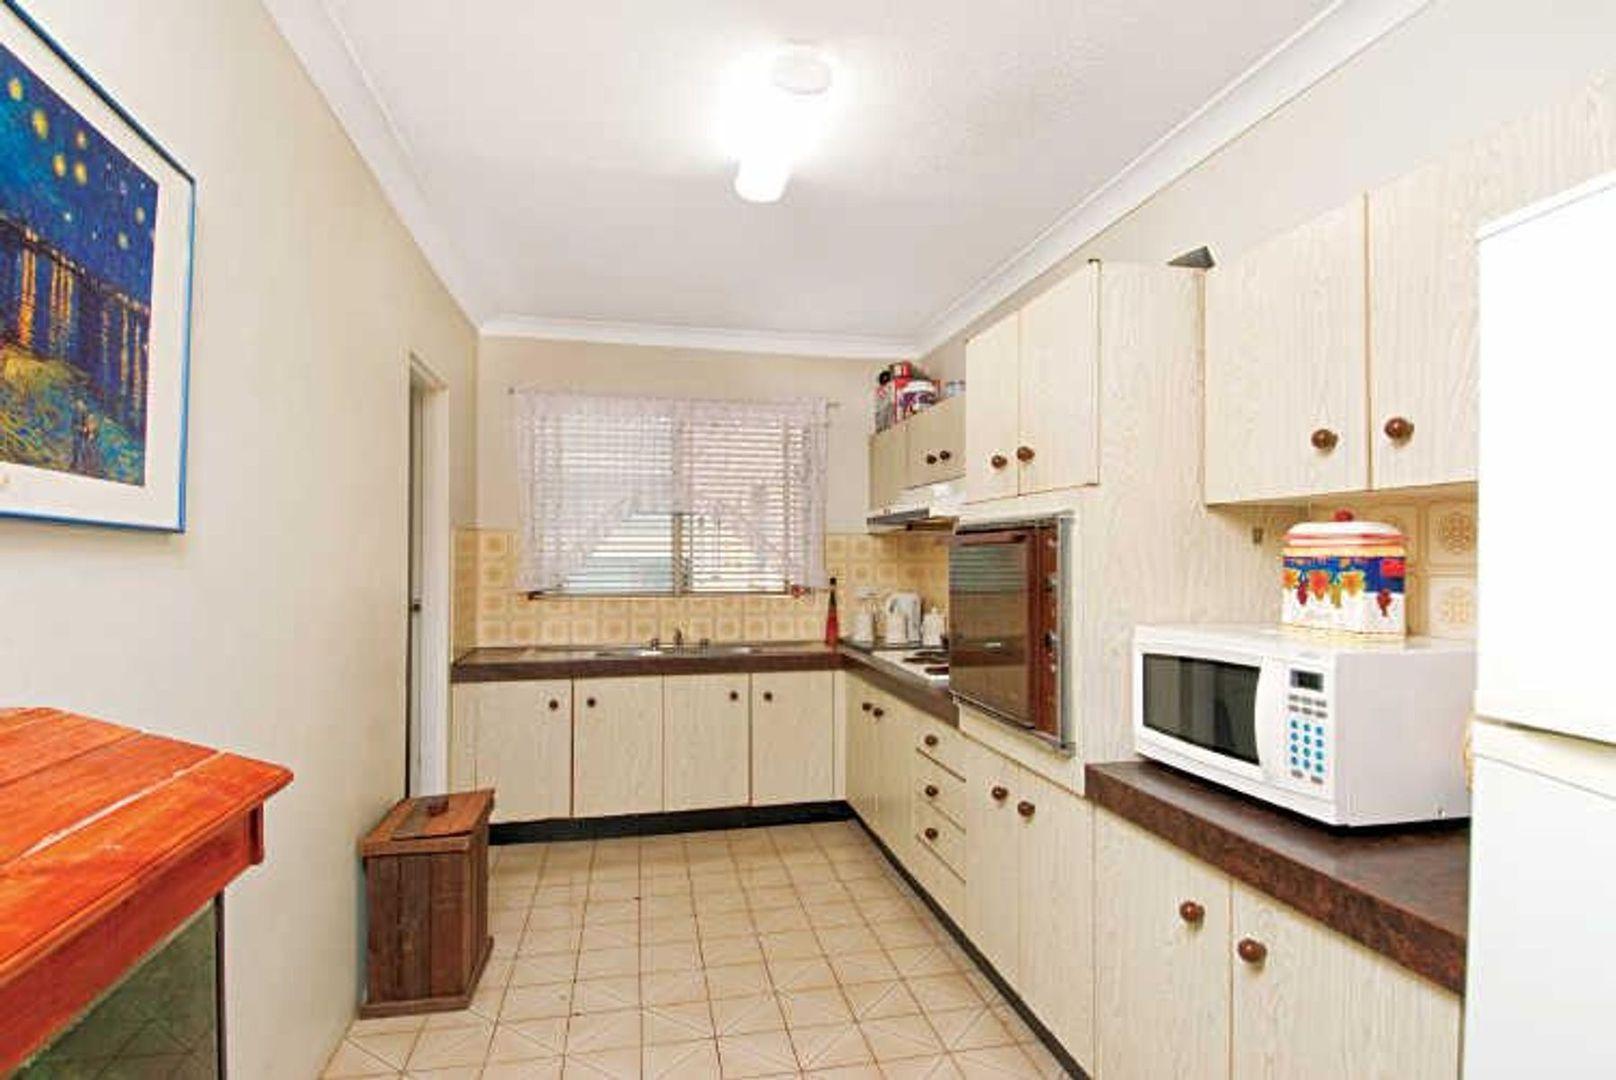 1/102 O'Connell Street, North Parramatta NSW 2151, Image 0